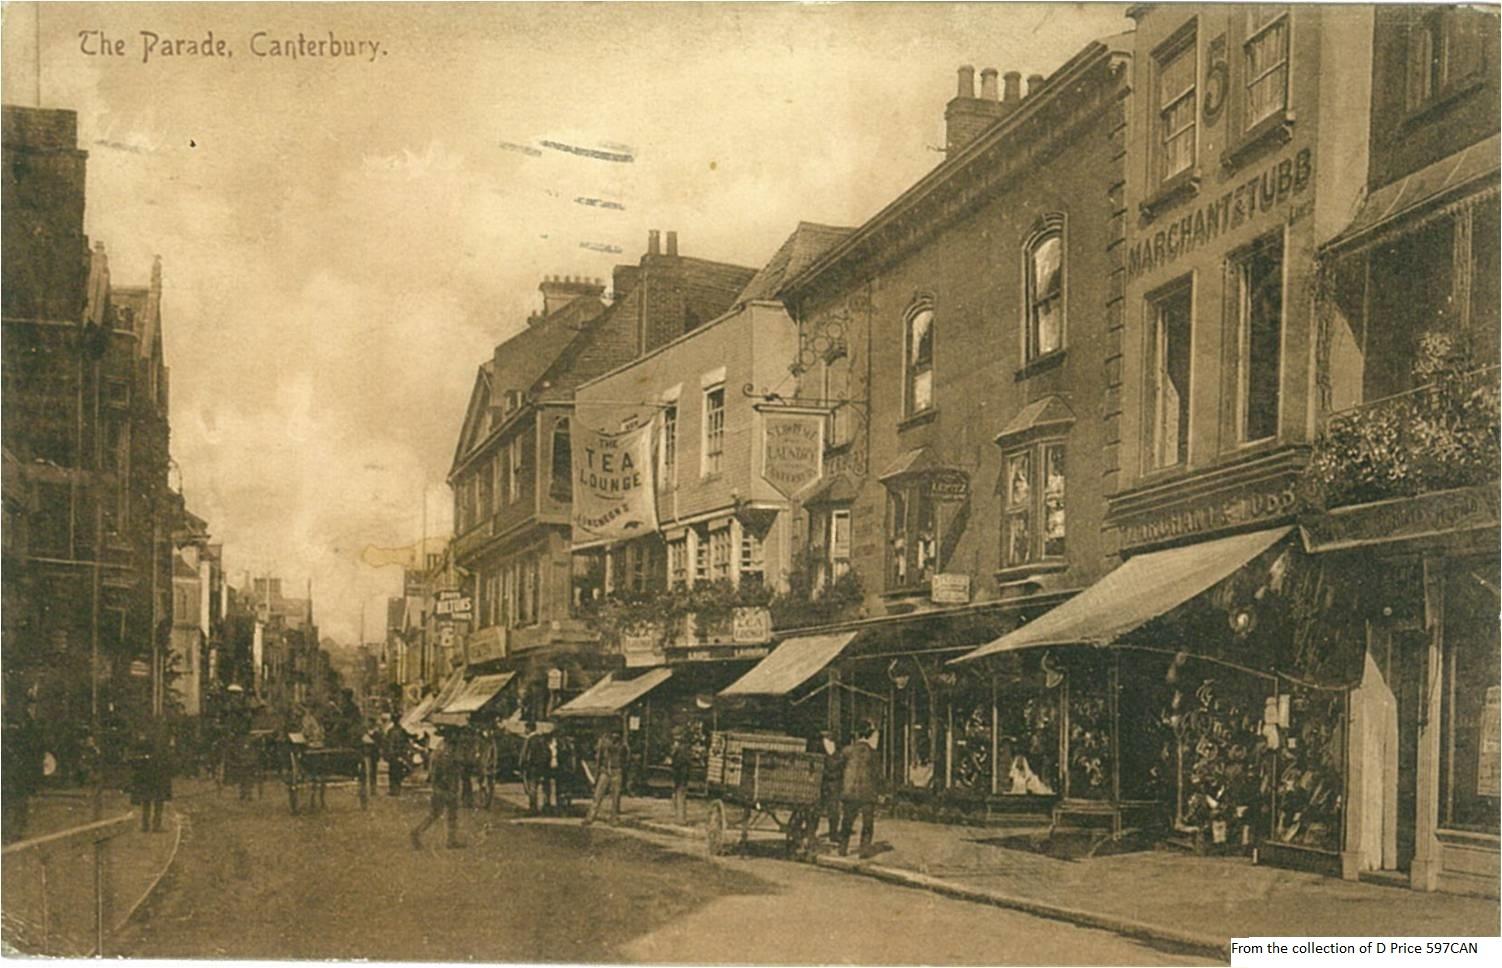 The Parade, Canterbury (Front)